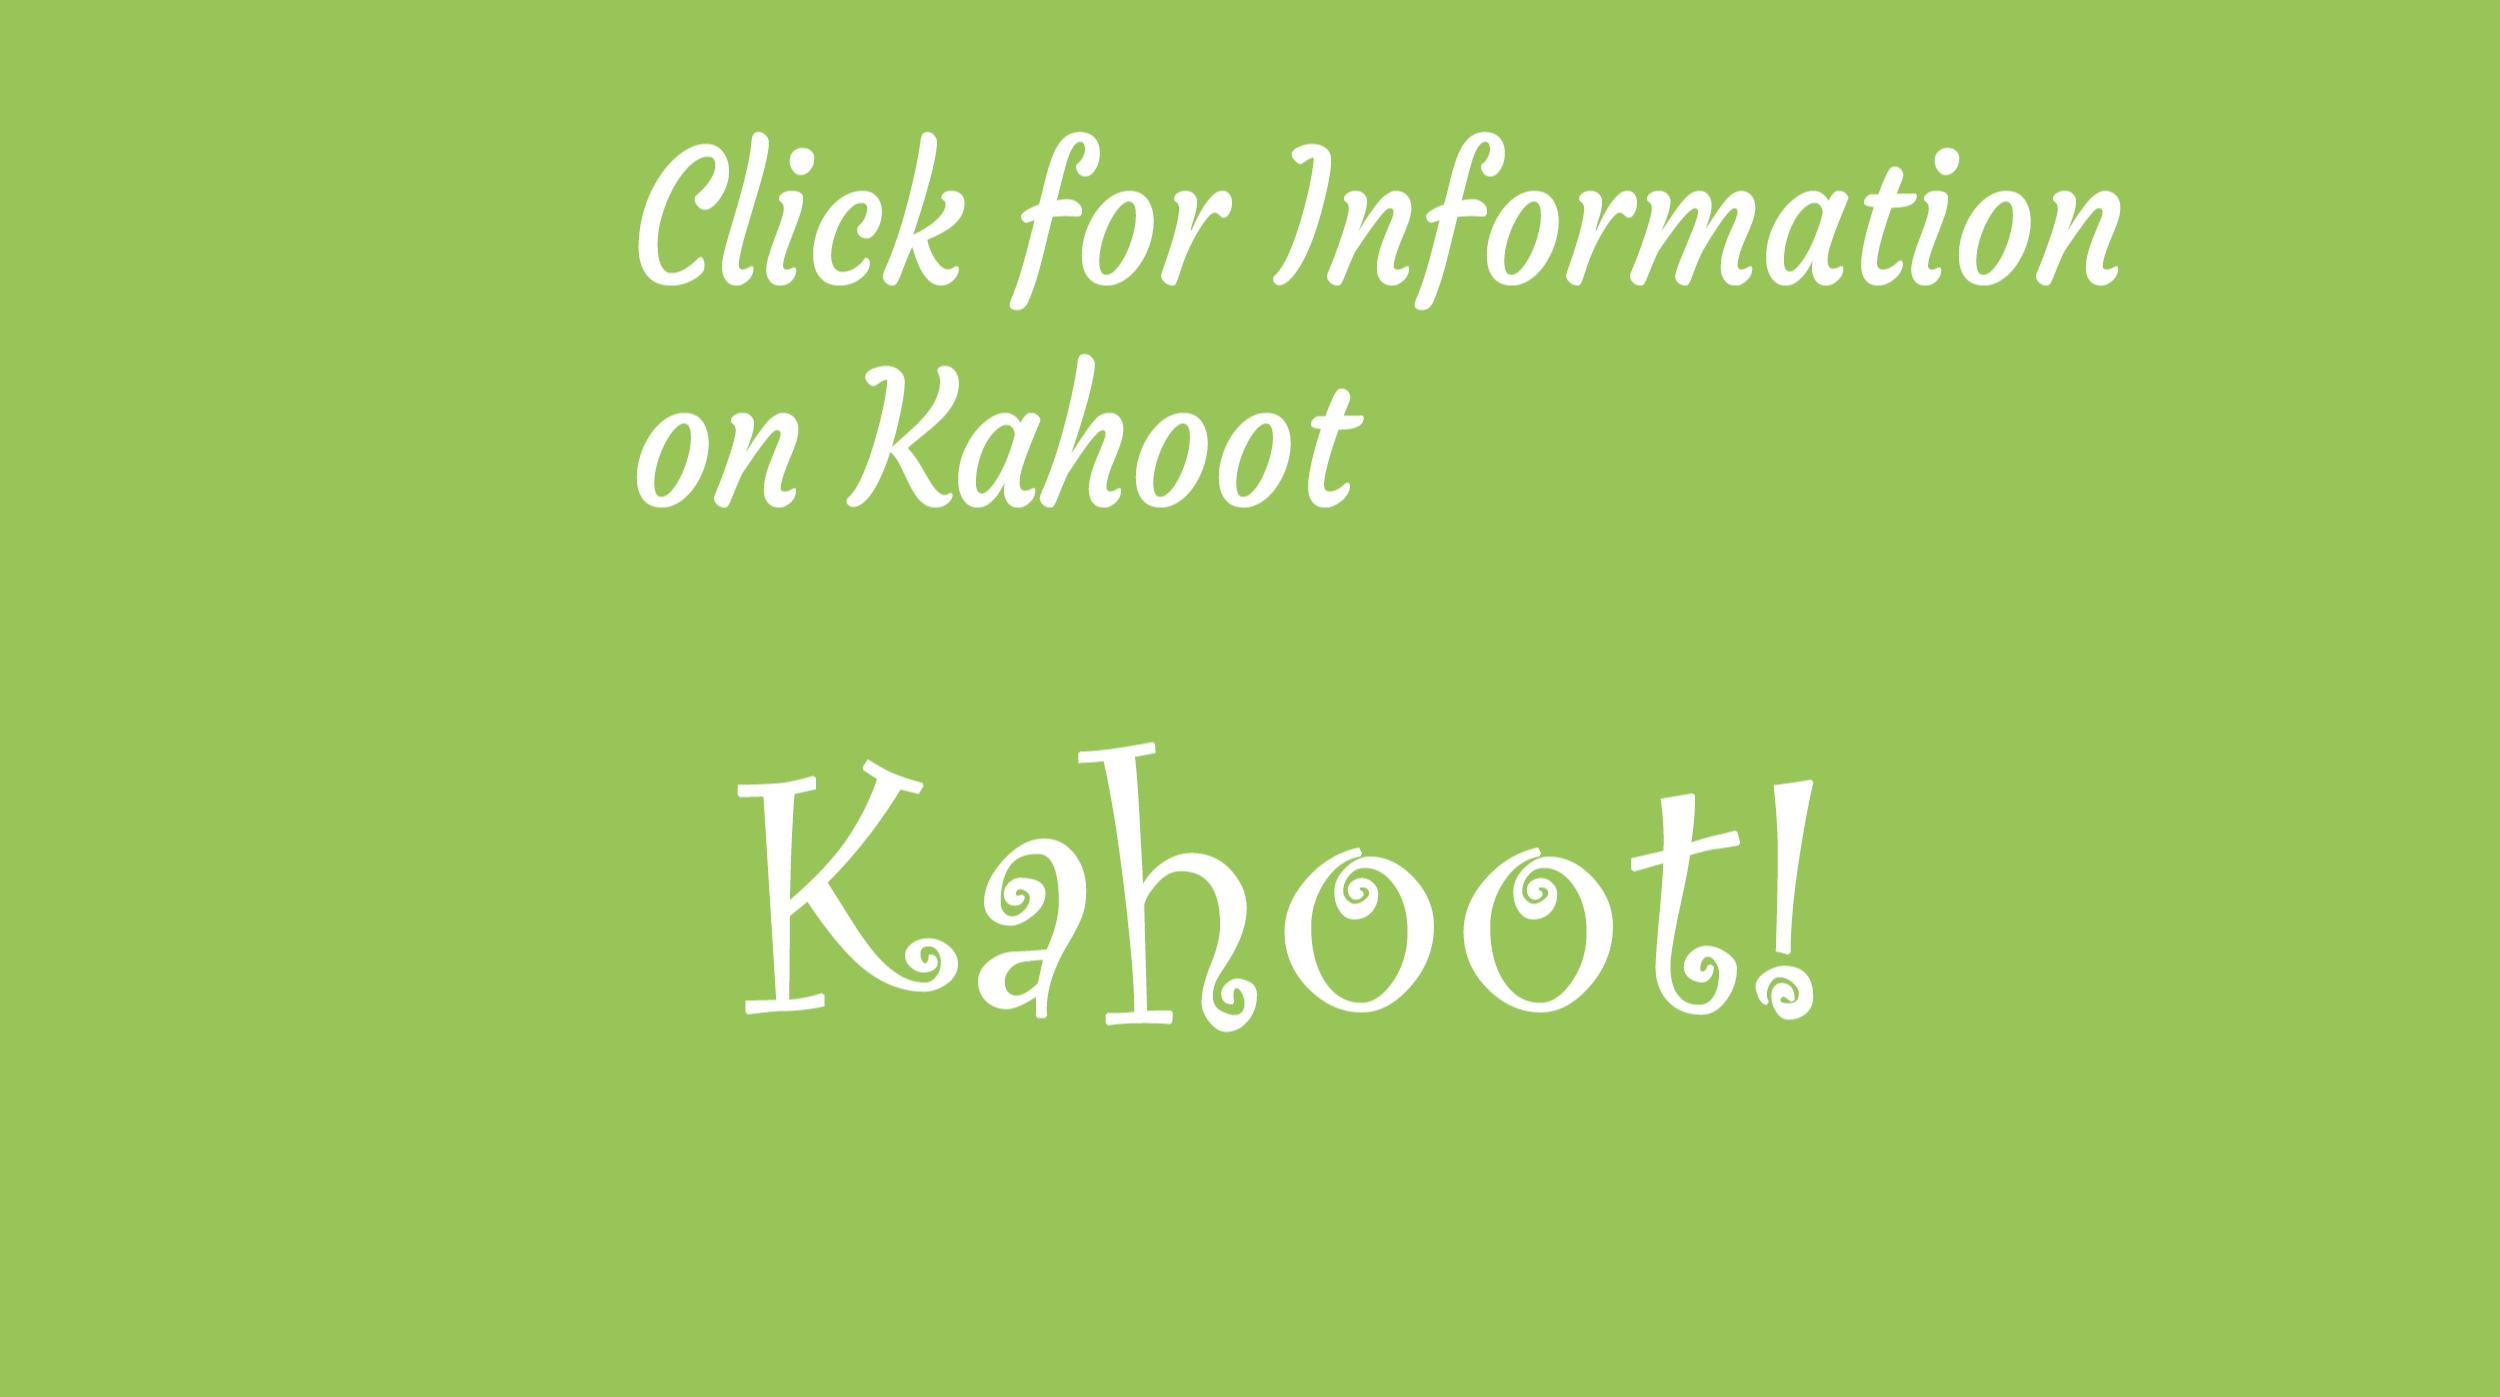 kahoot image